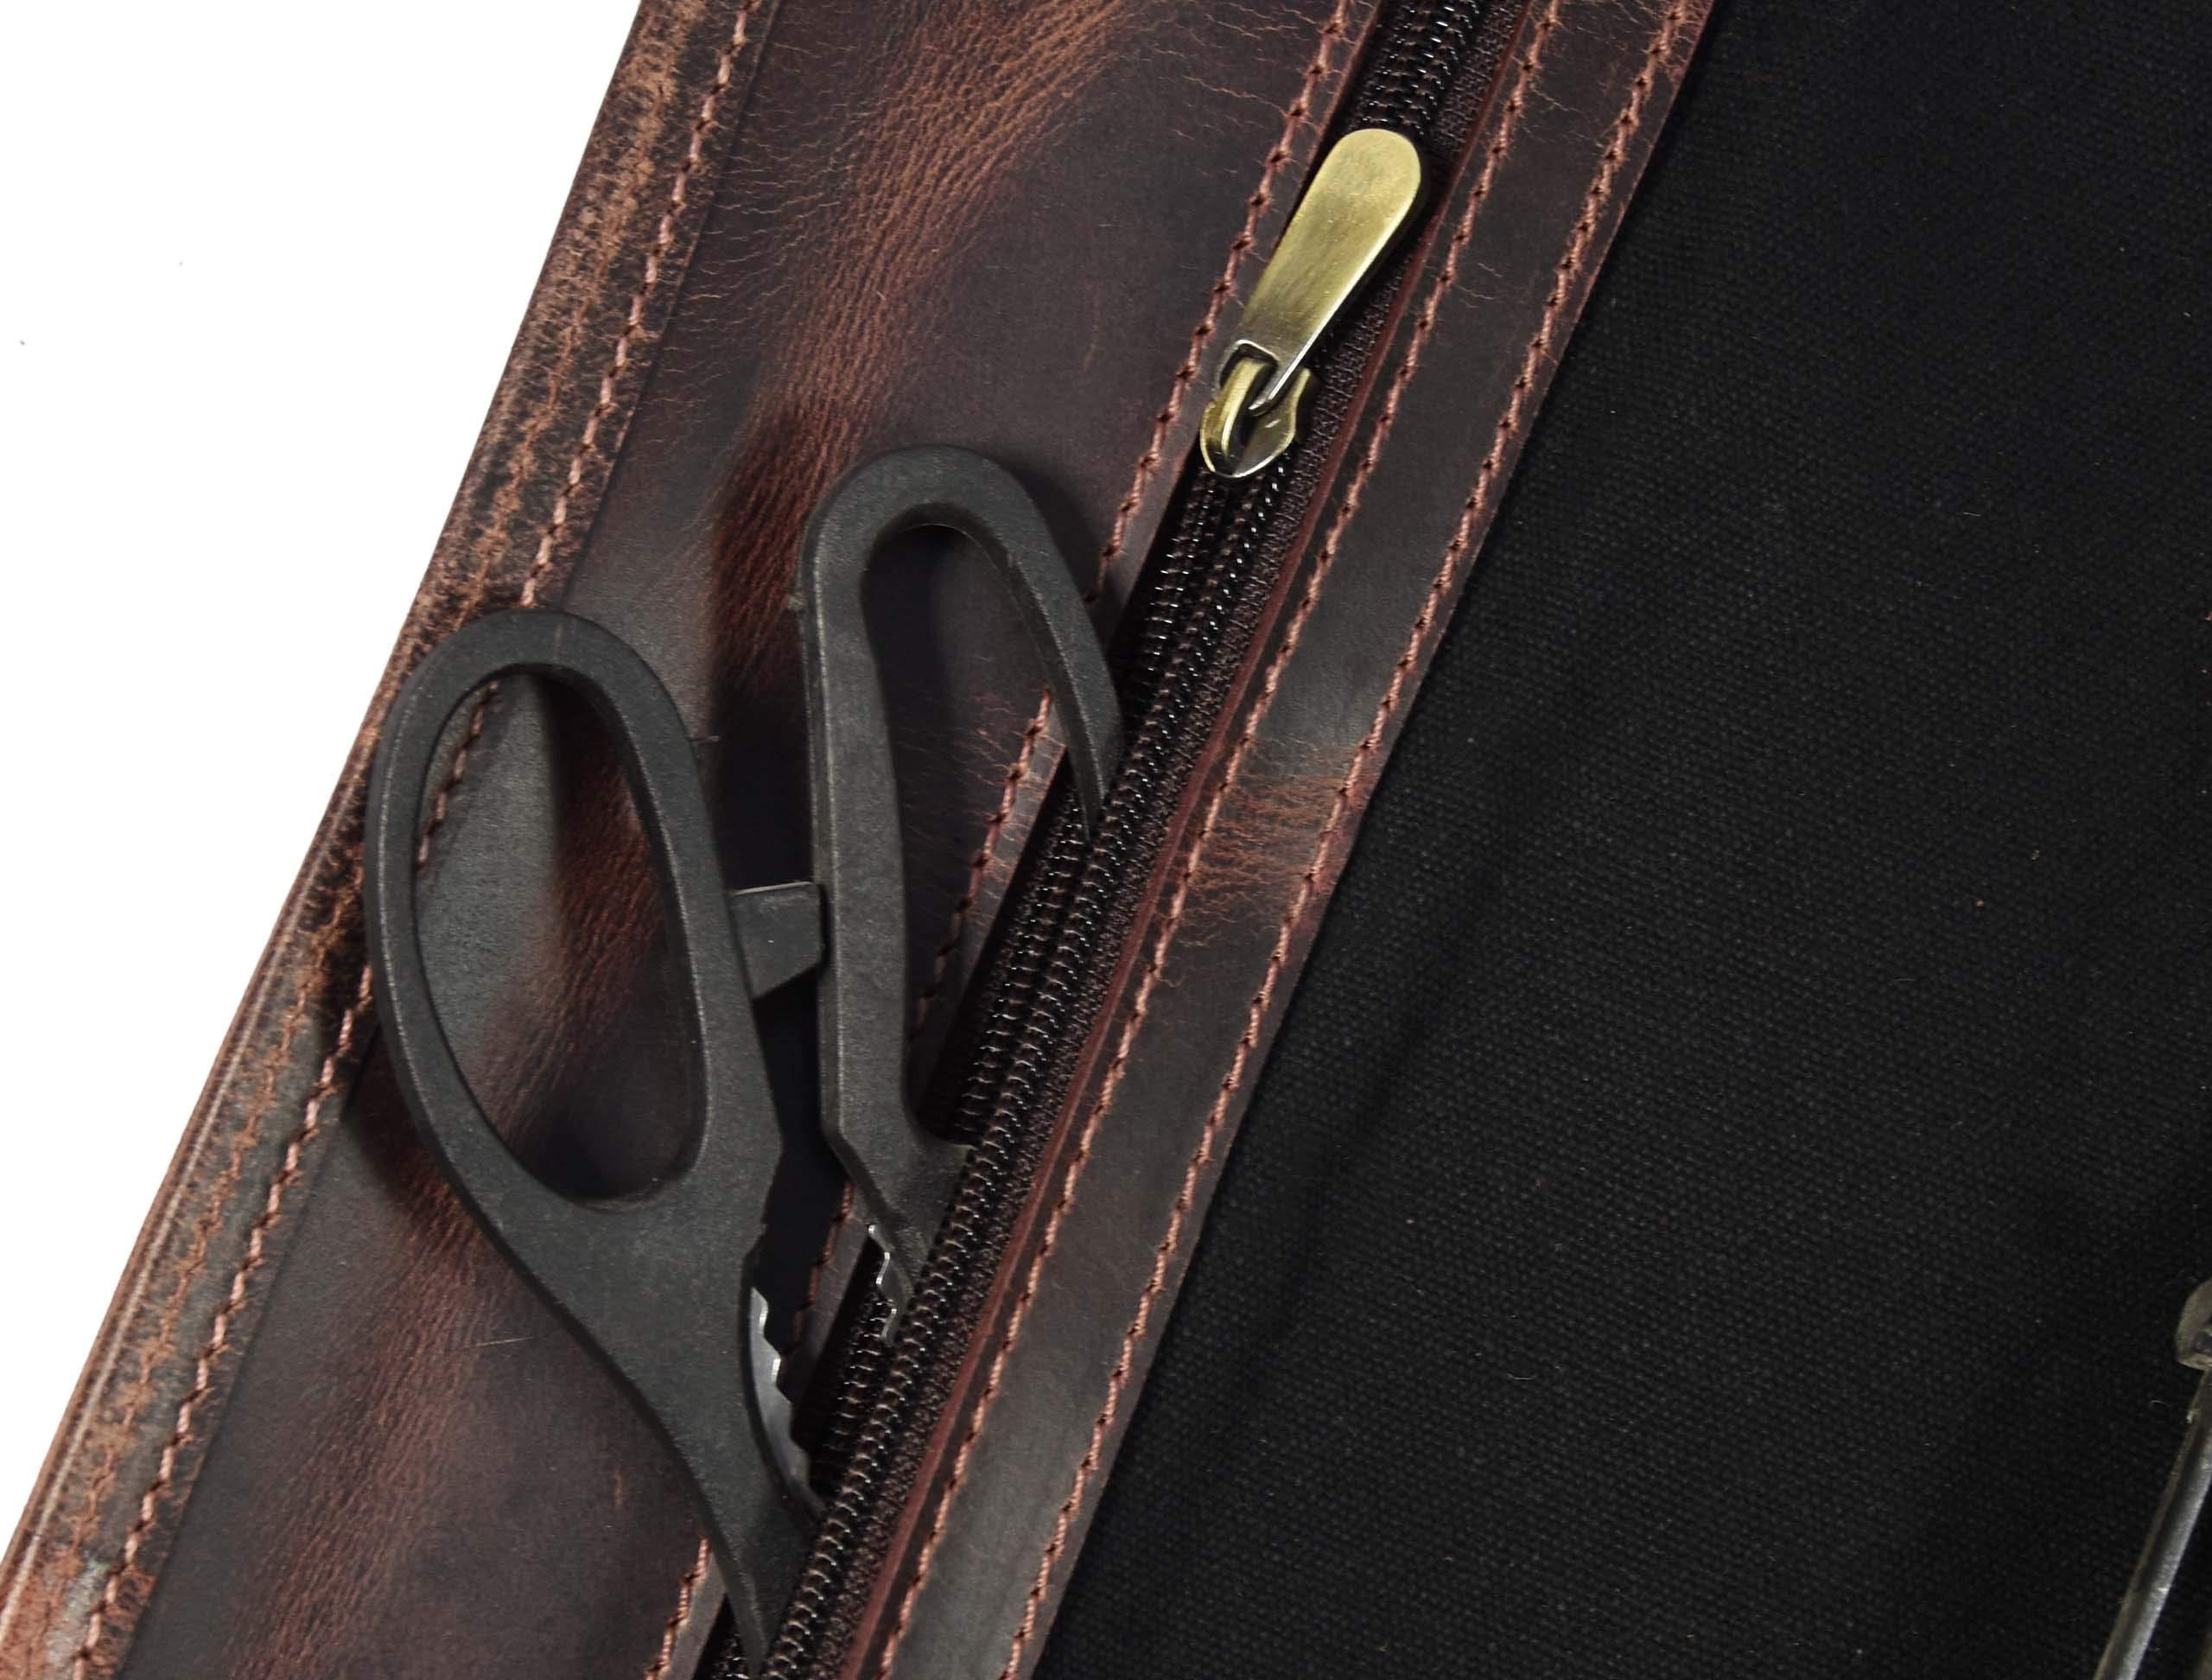 Leather Knife Roll Storage Bag   Elastic and Expandable 10 Pockets   Adjustable/Detachable Shoulder Strap   Travel-Friendly Chef Knife Case Roll By Aaron Leather (Raven, Canvas) by AARON LEATHER GOODS VENDIMIA ESTILO (Image #4)